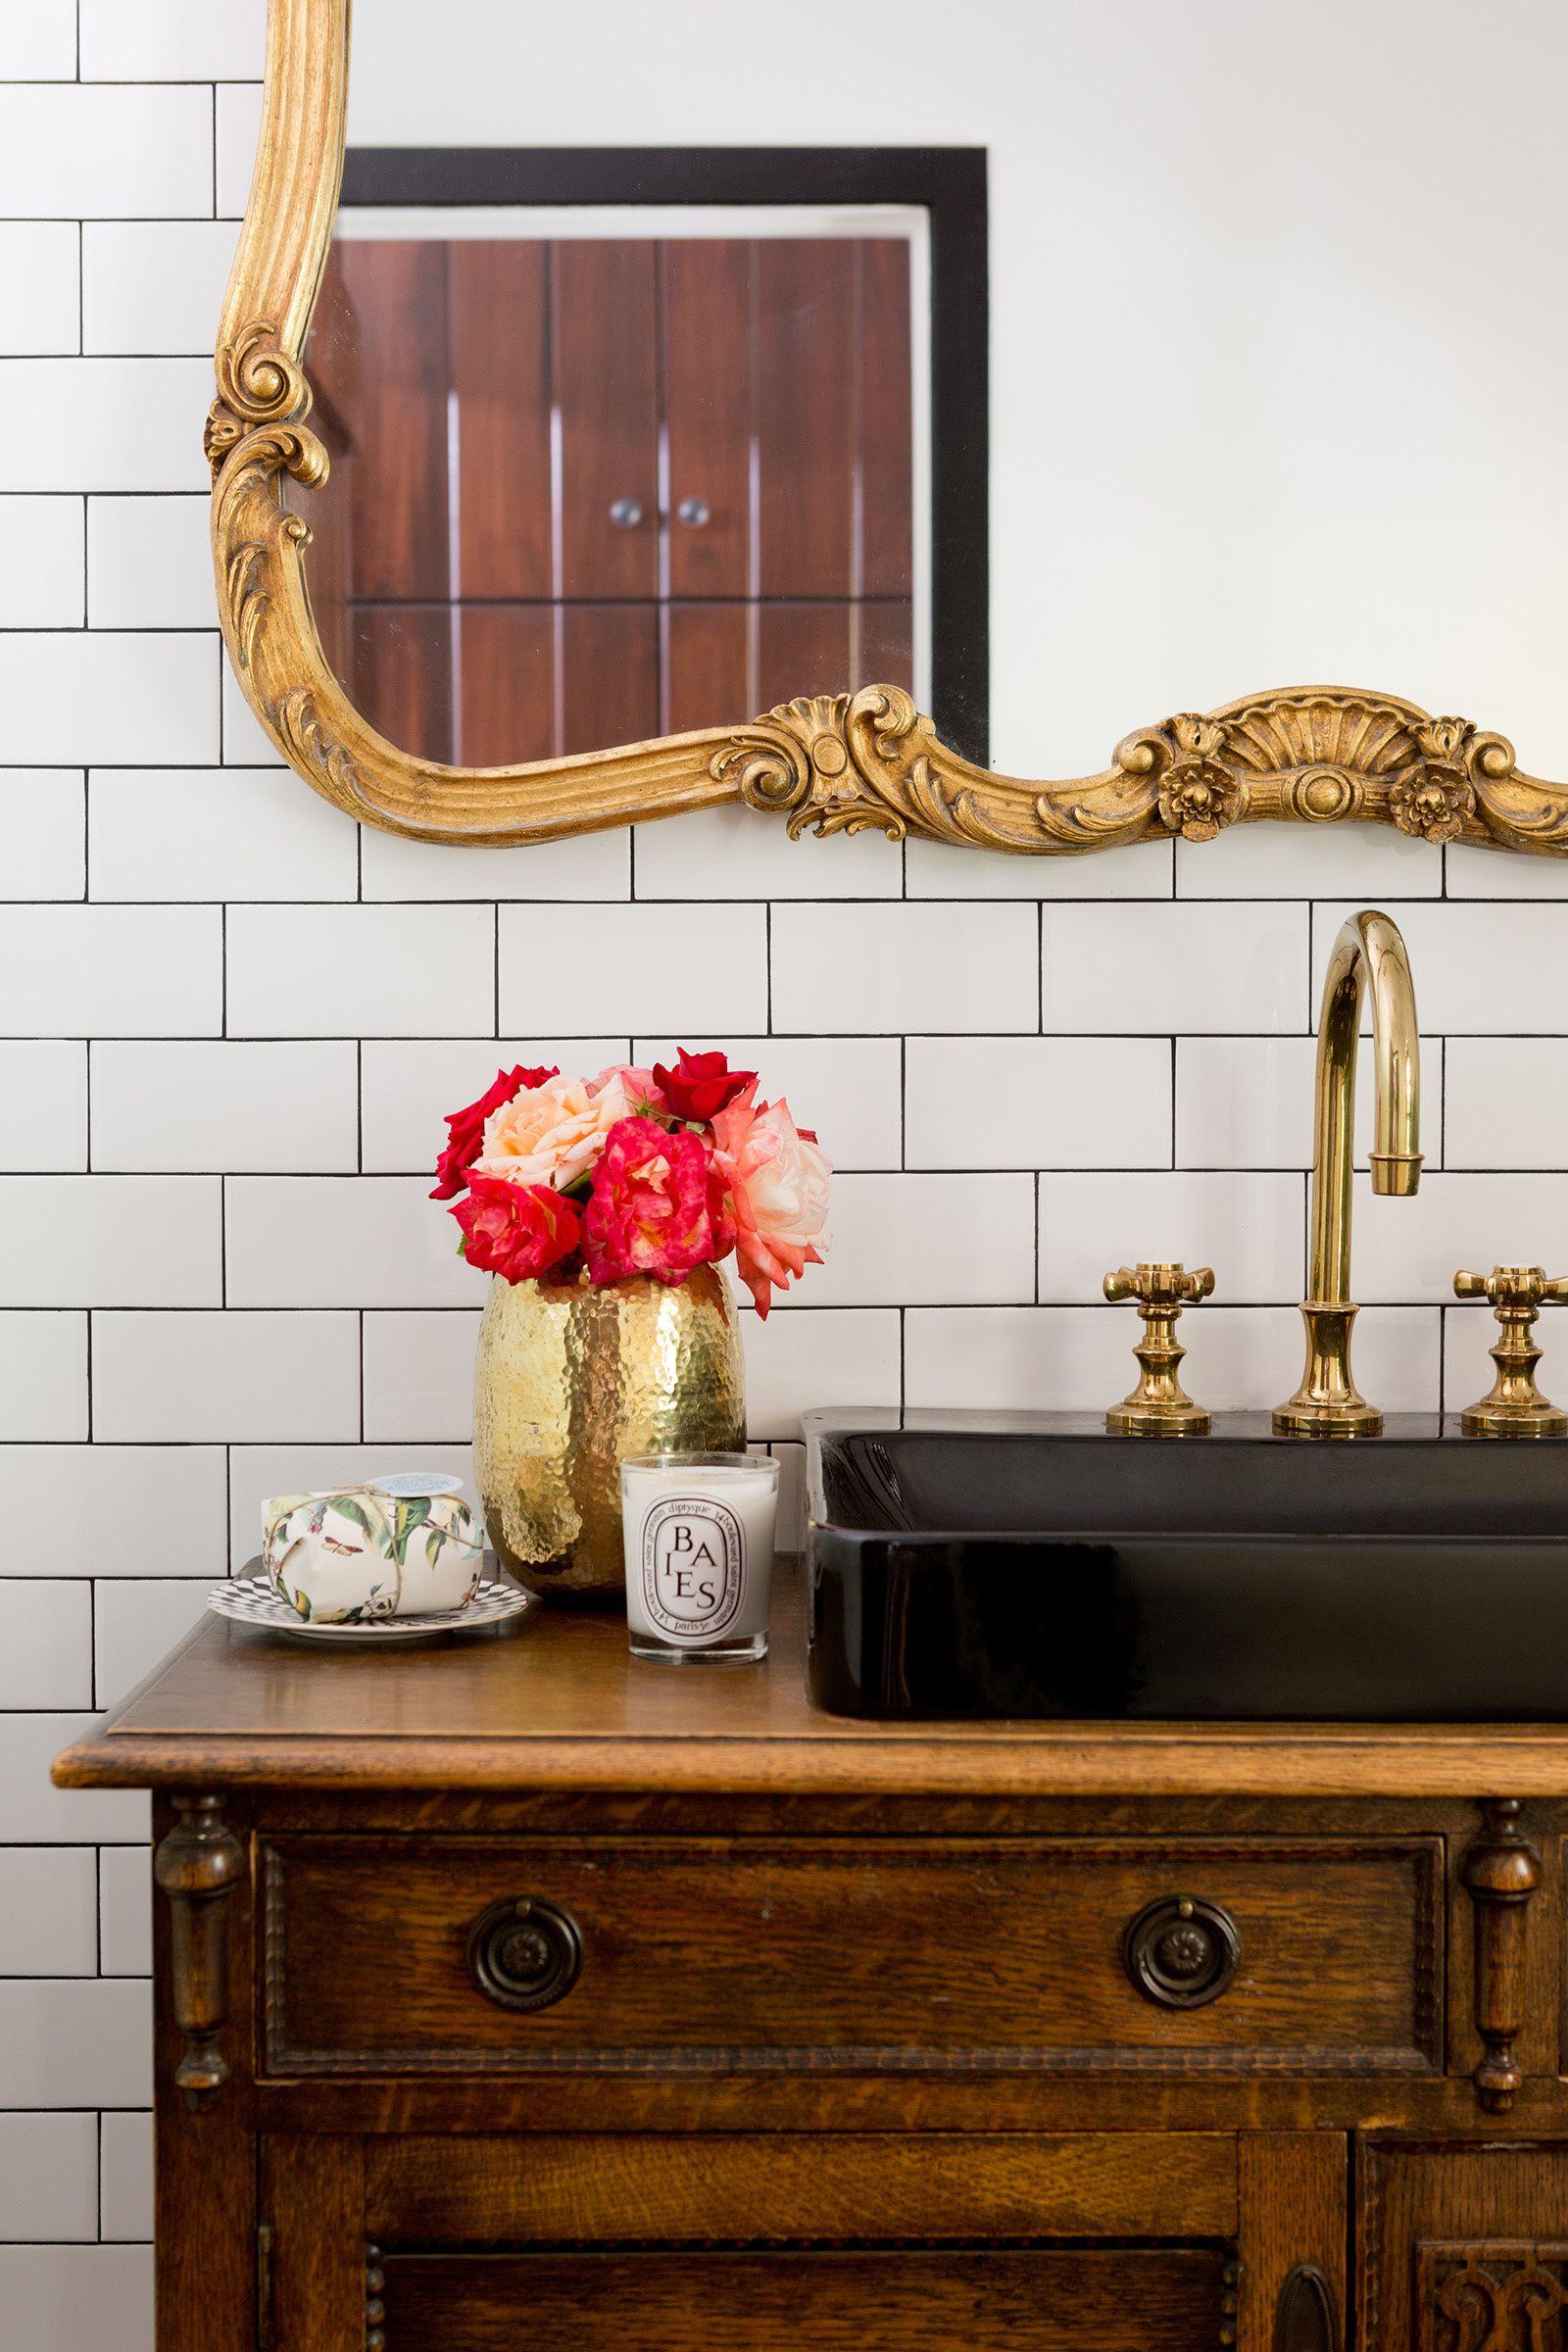 Powder Room By Amy Kartheiser Design: Black Sink And Vintage Dresser In The Powder Room. Photo